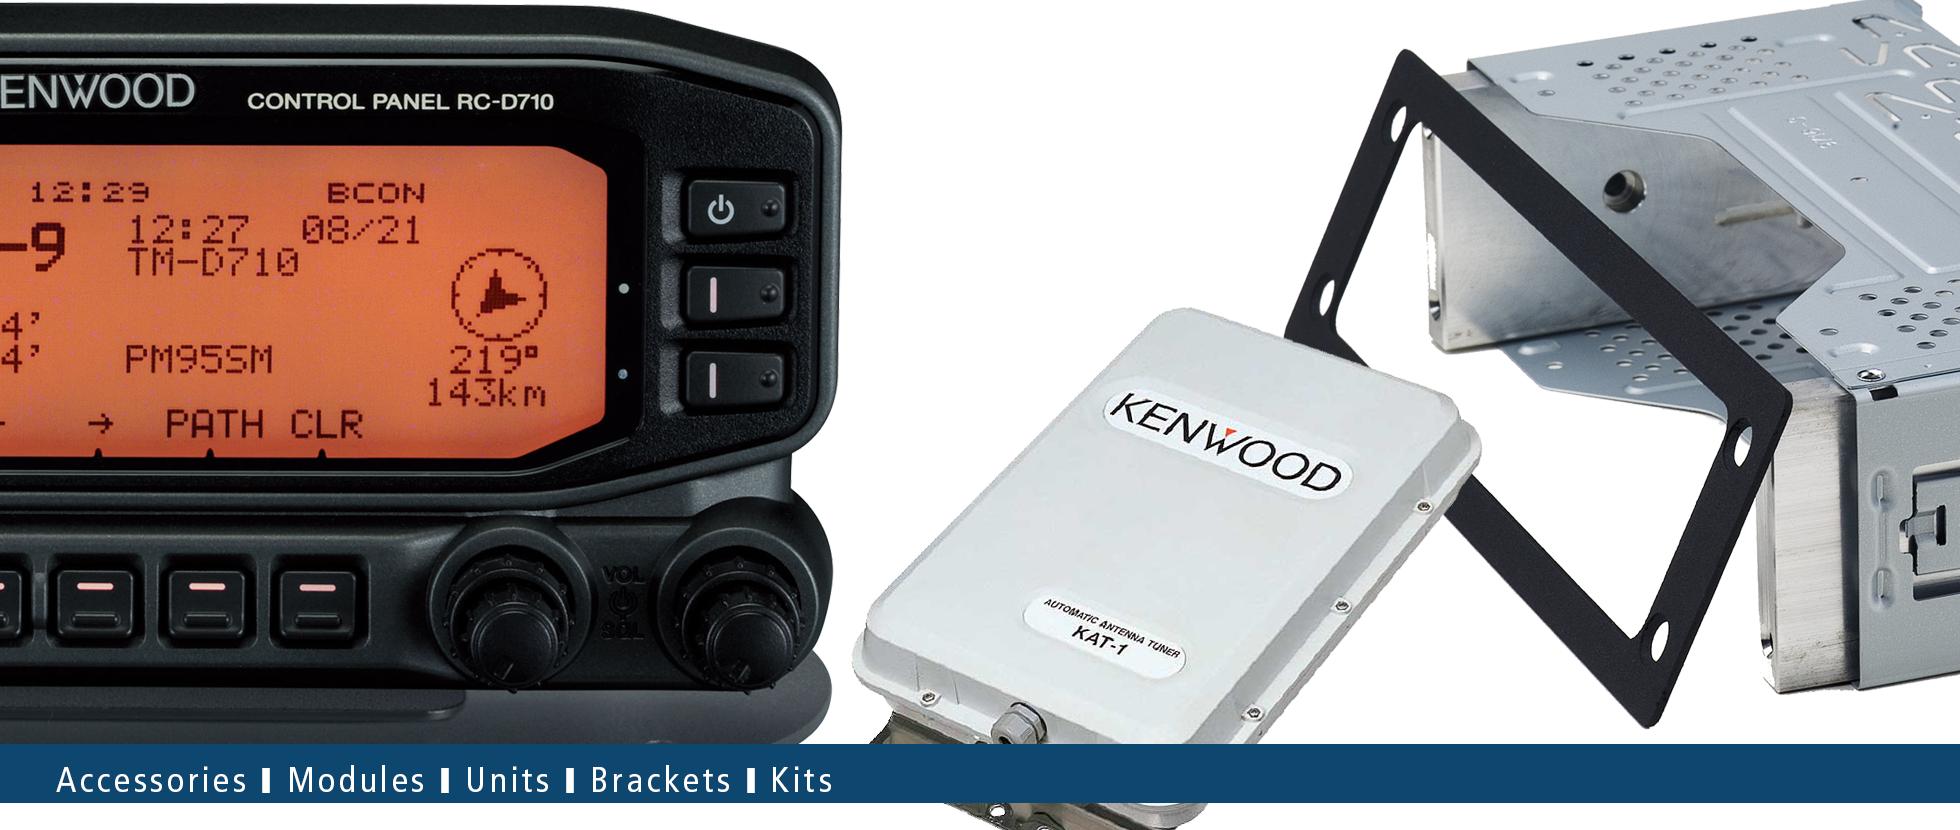 Modules | Units | Brackets | Kits • Kenwood Comms